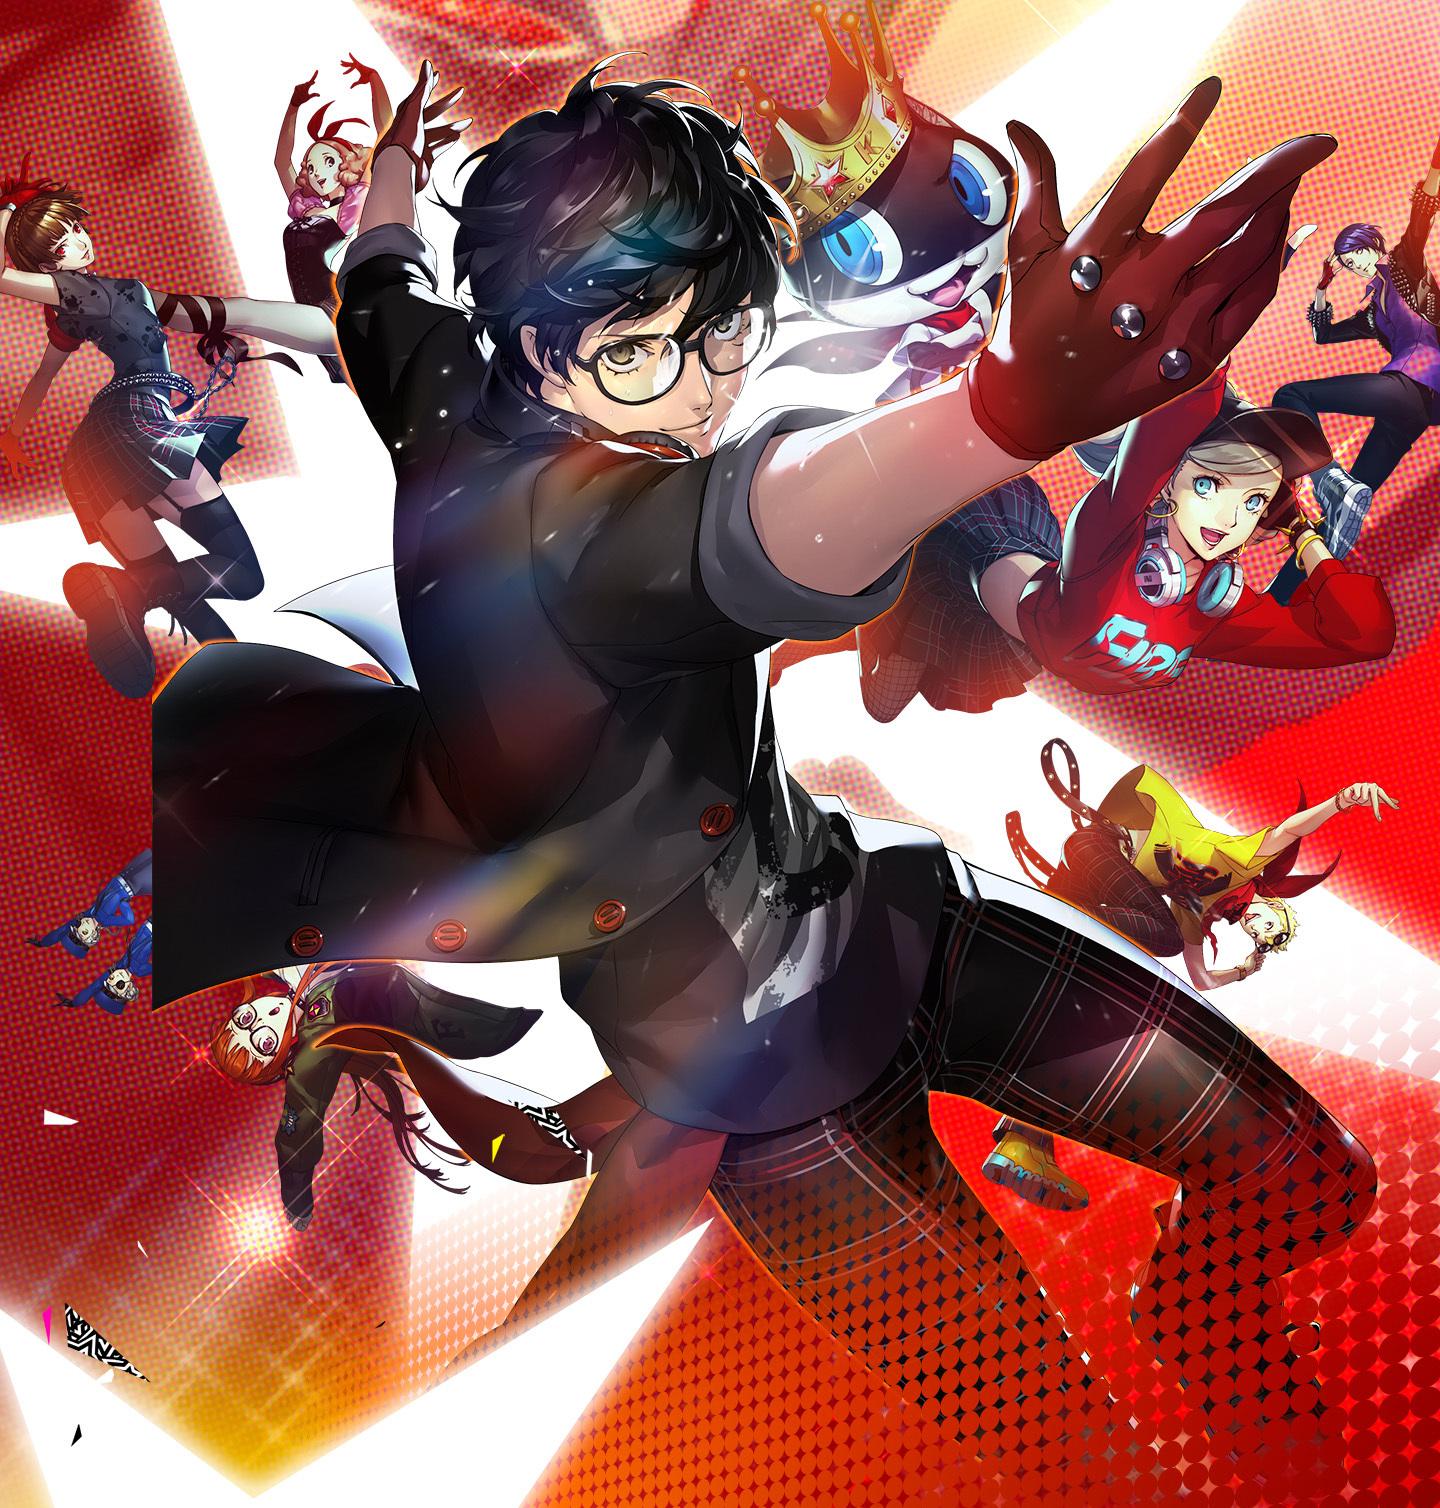 Phantom Thieves of Hearts | Megami Tensei Wiki | FANDOM